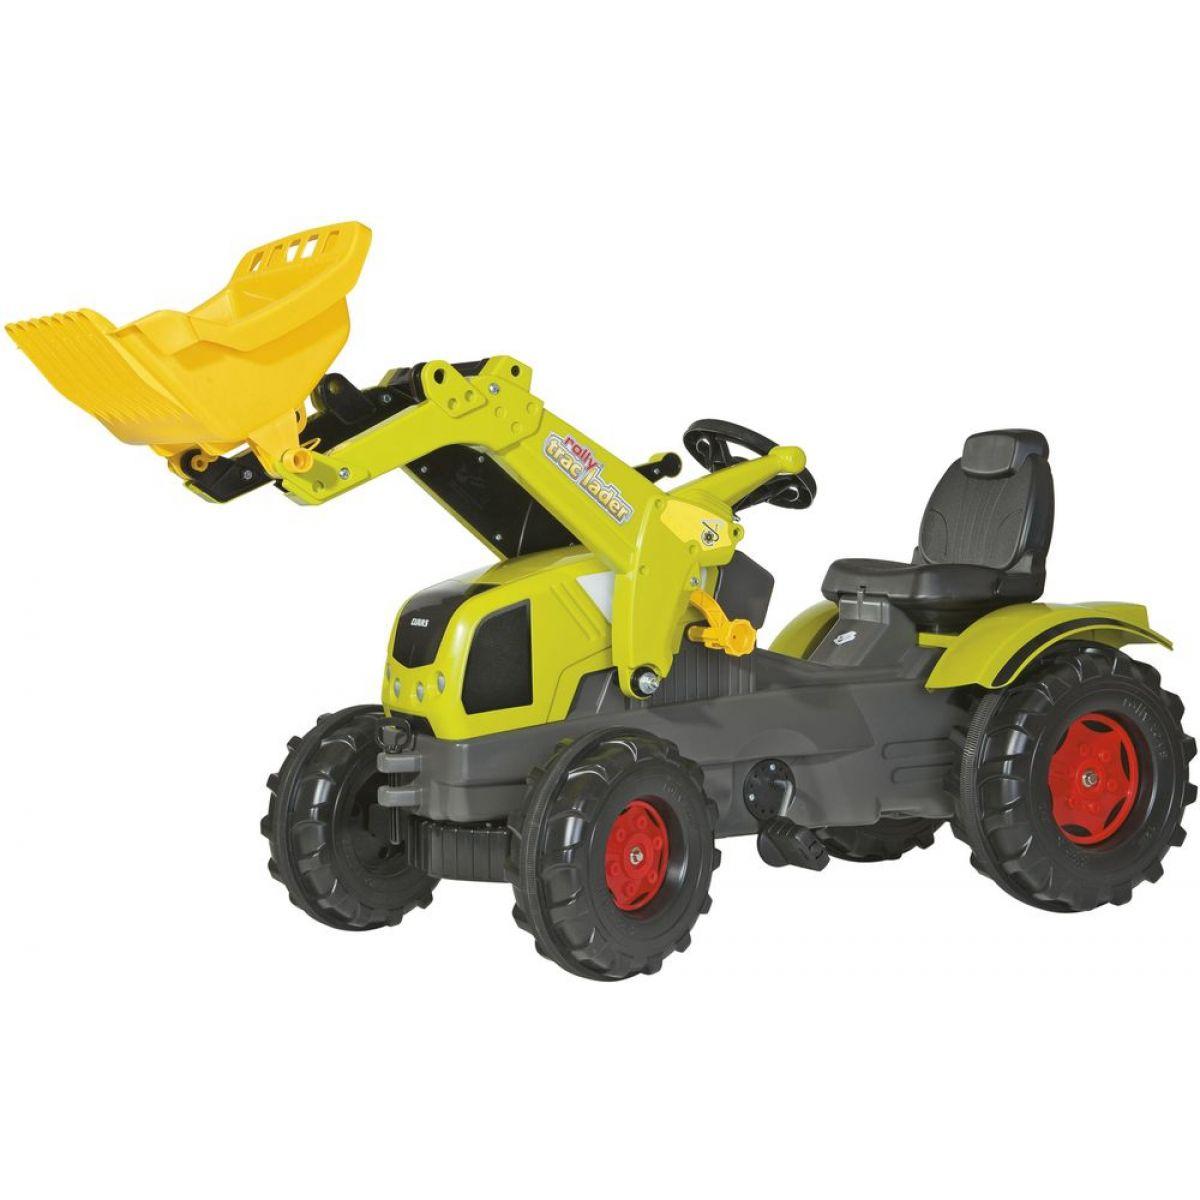 Rolly Toys Šlapací traktor Claas Axos 340 s nakladačem Rolly Toys